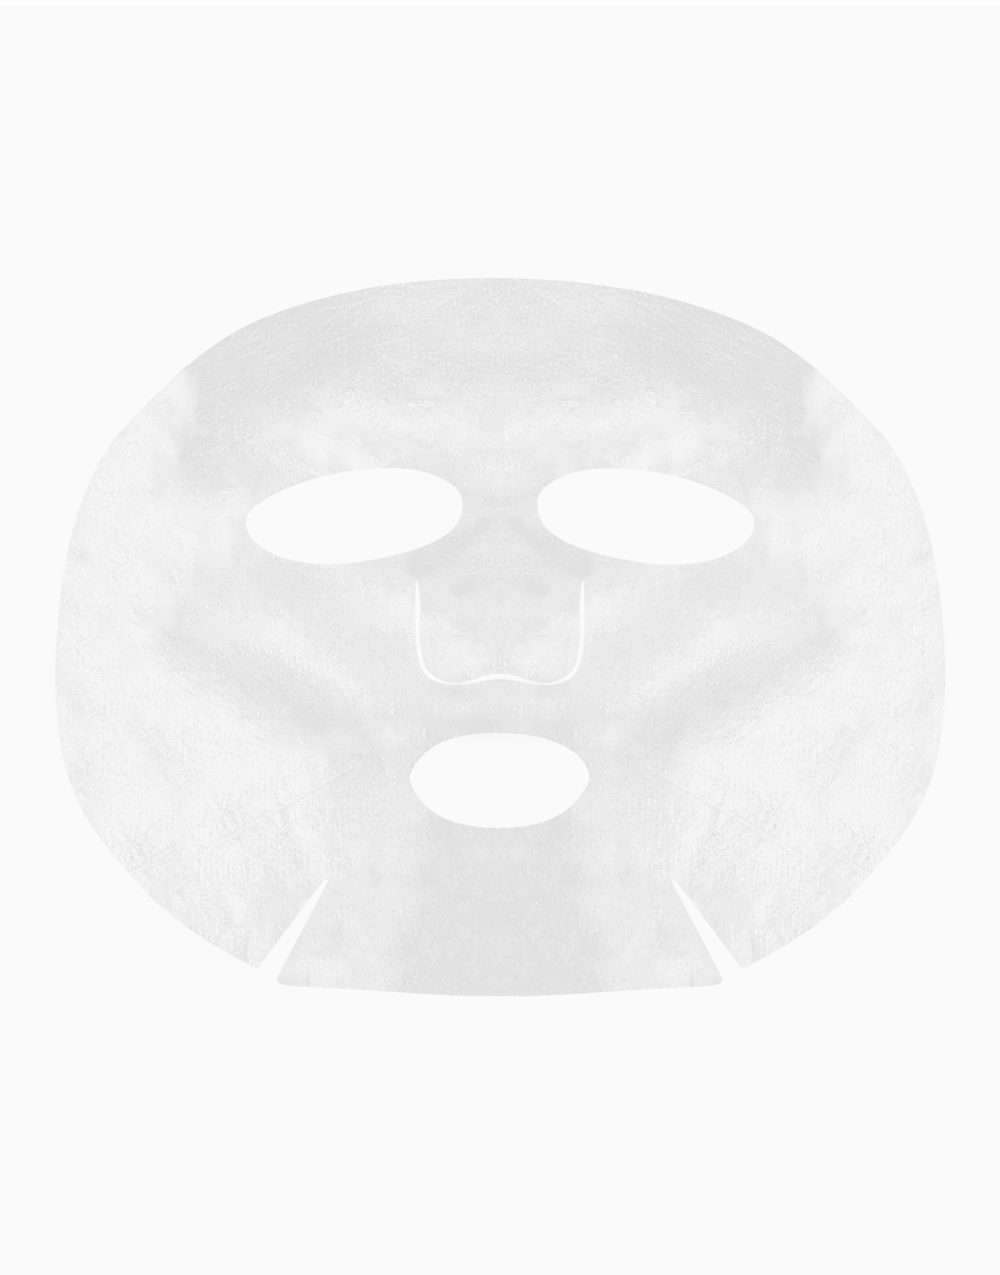 Pure Skin Green Tea Essence Mask Sheet by Esfolio